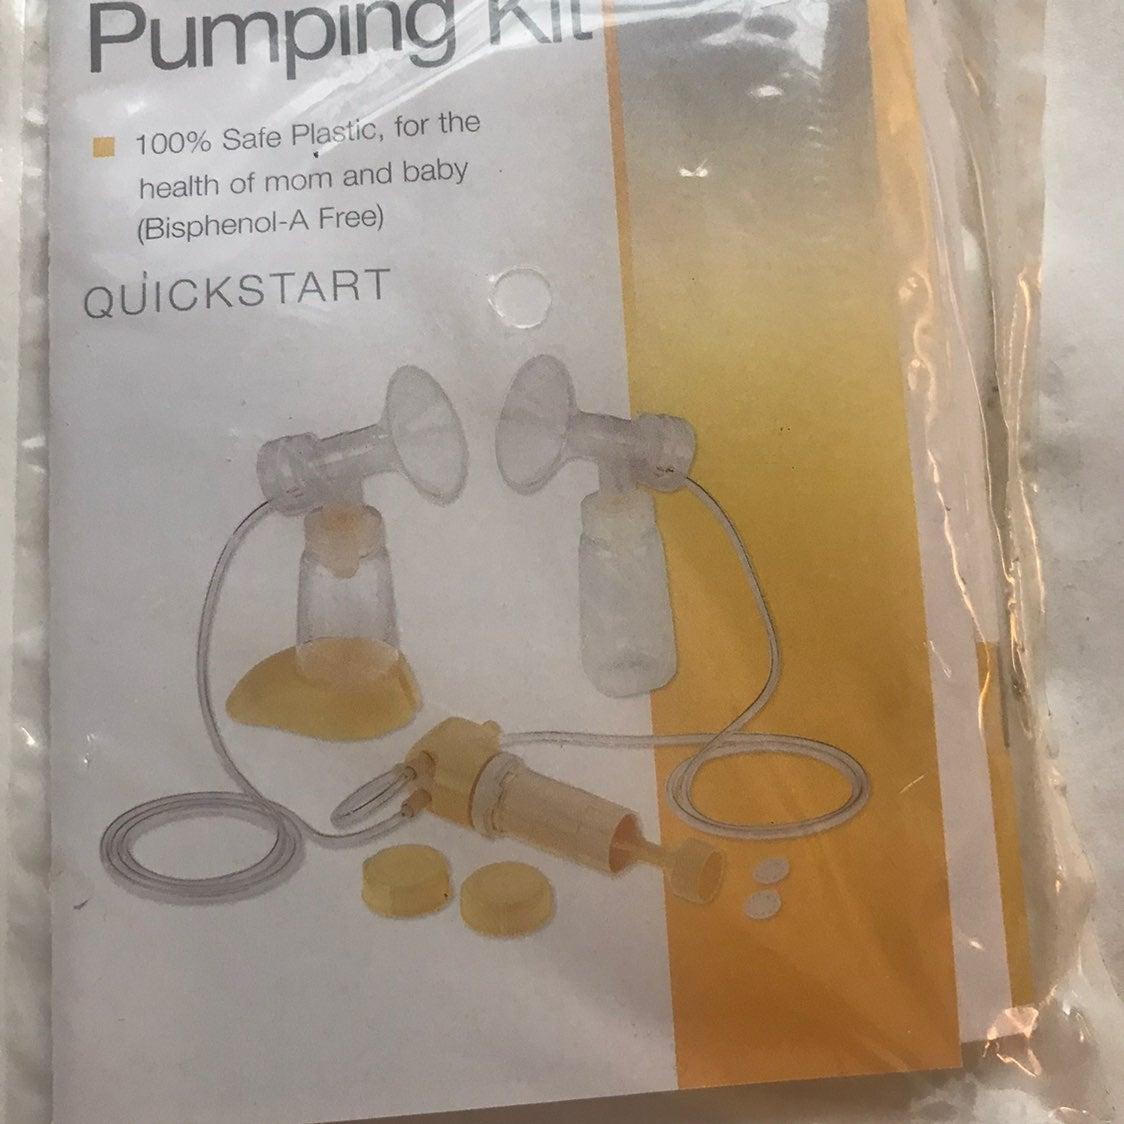 Medela Lactina Double Pumping System Kit